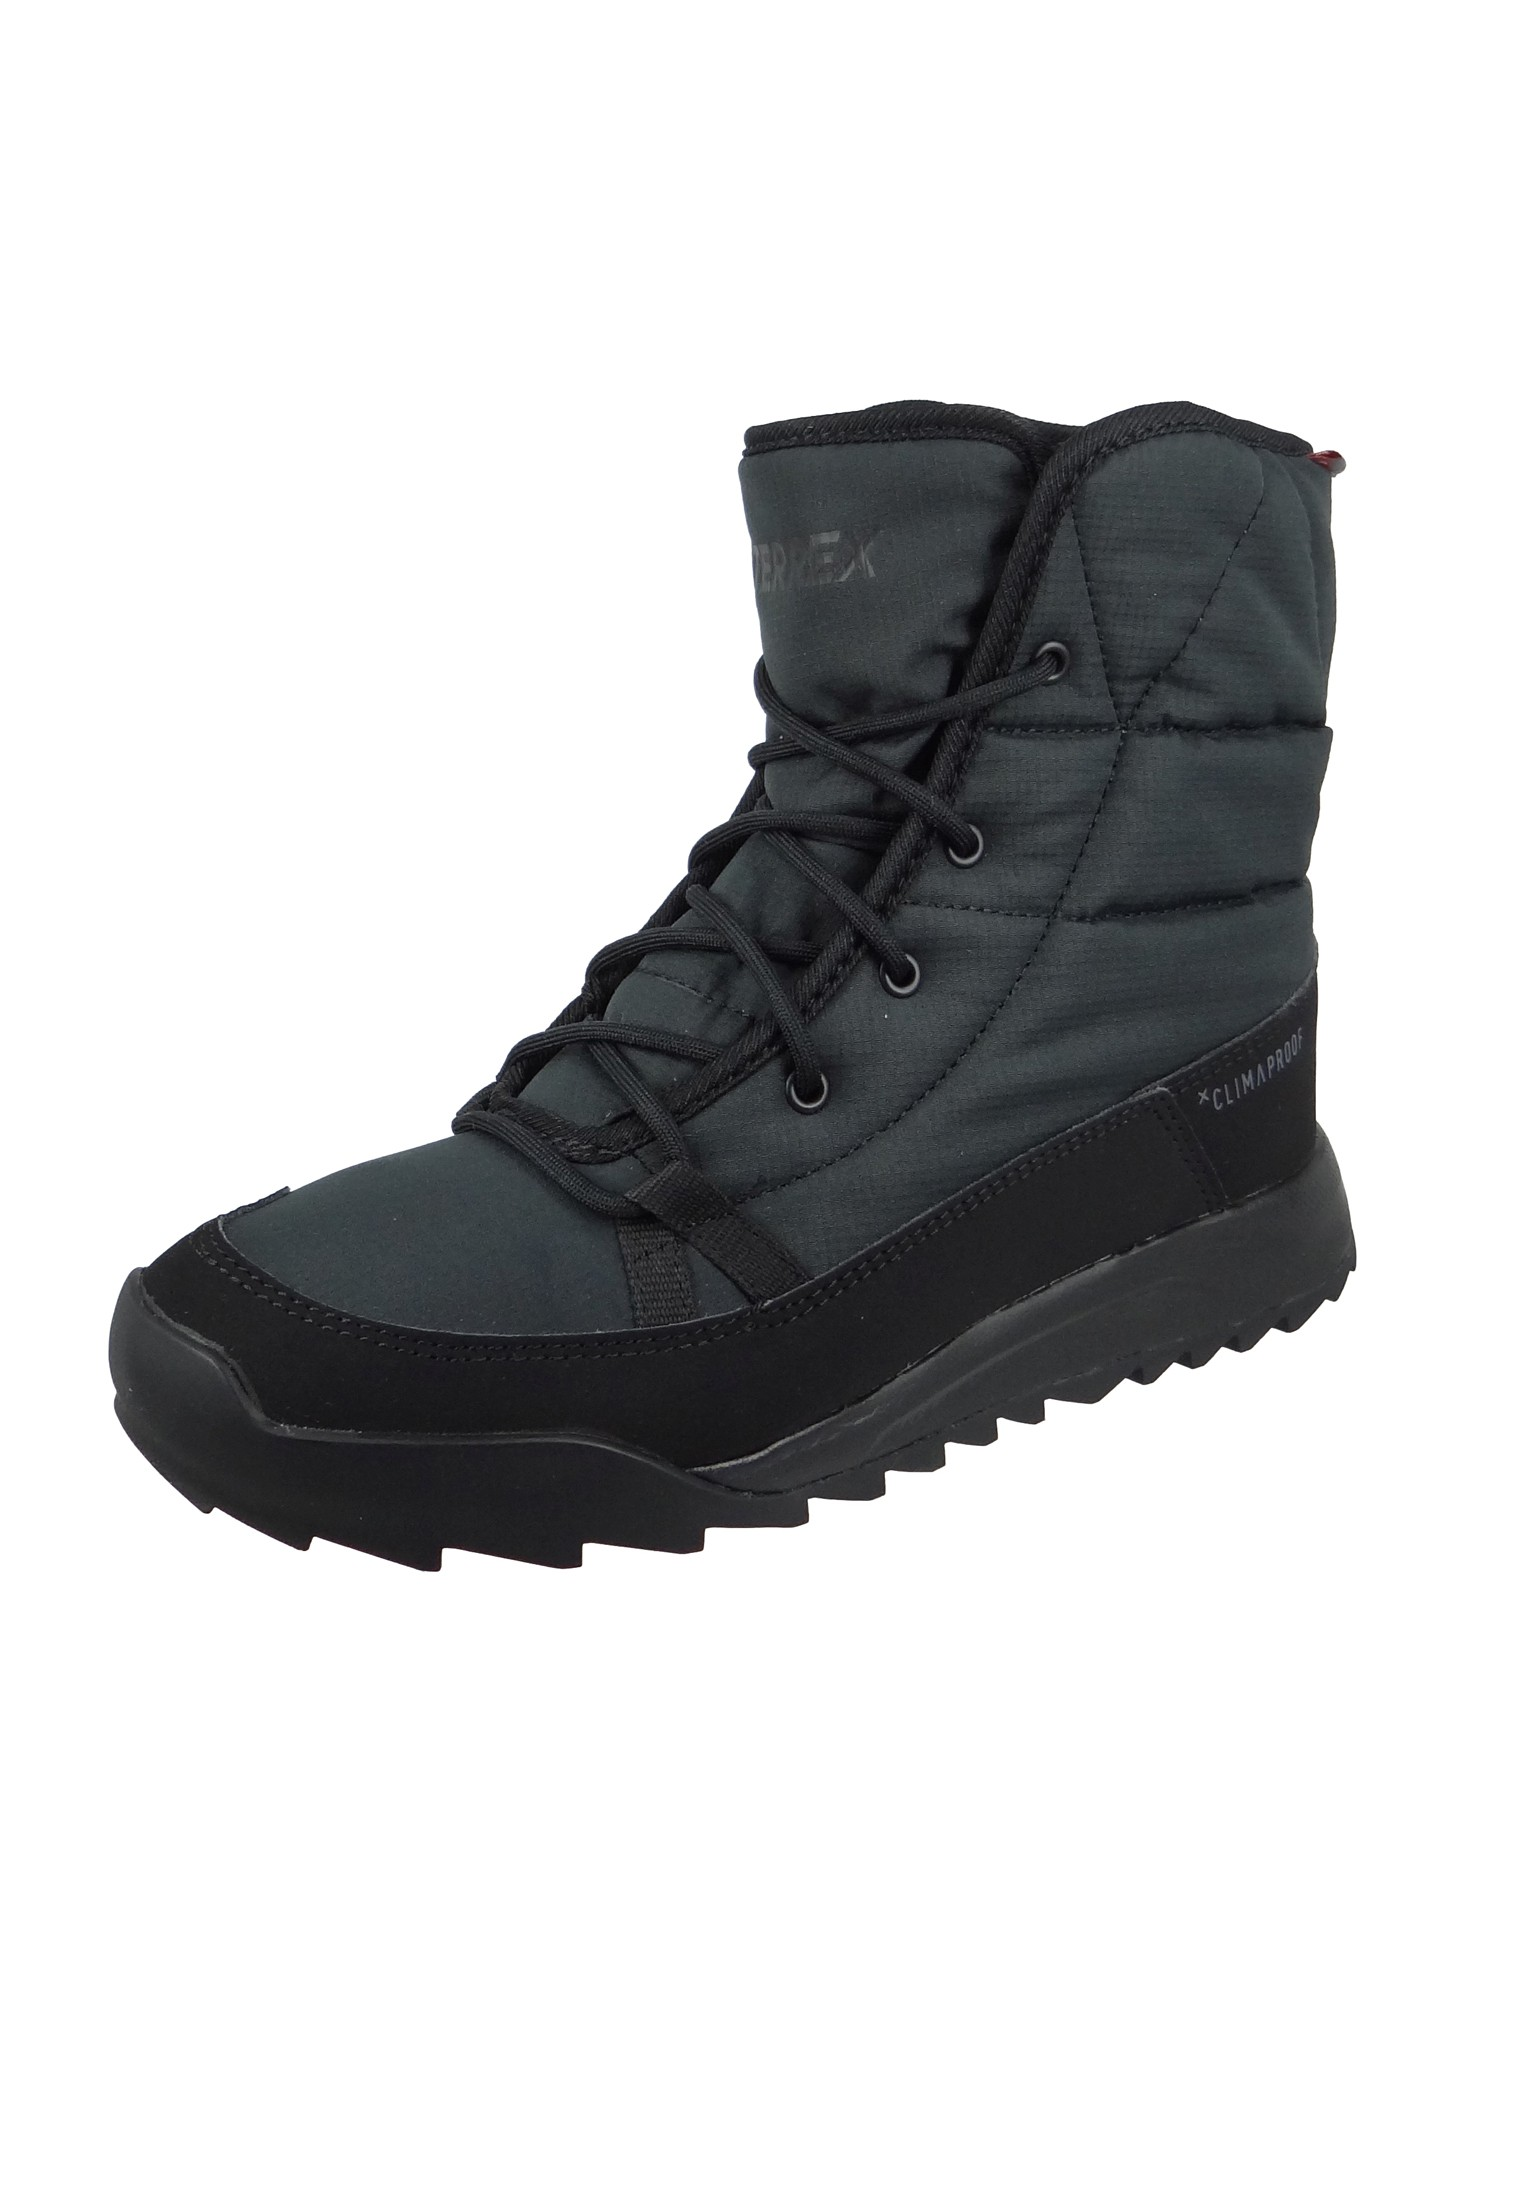 brand new c68b1 16e82 adidas TERREX CHOLEAH PADDED CP CW W S80748 Damen Winterstiefel Boots core  blackcore blackgrey five Schwarz